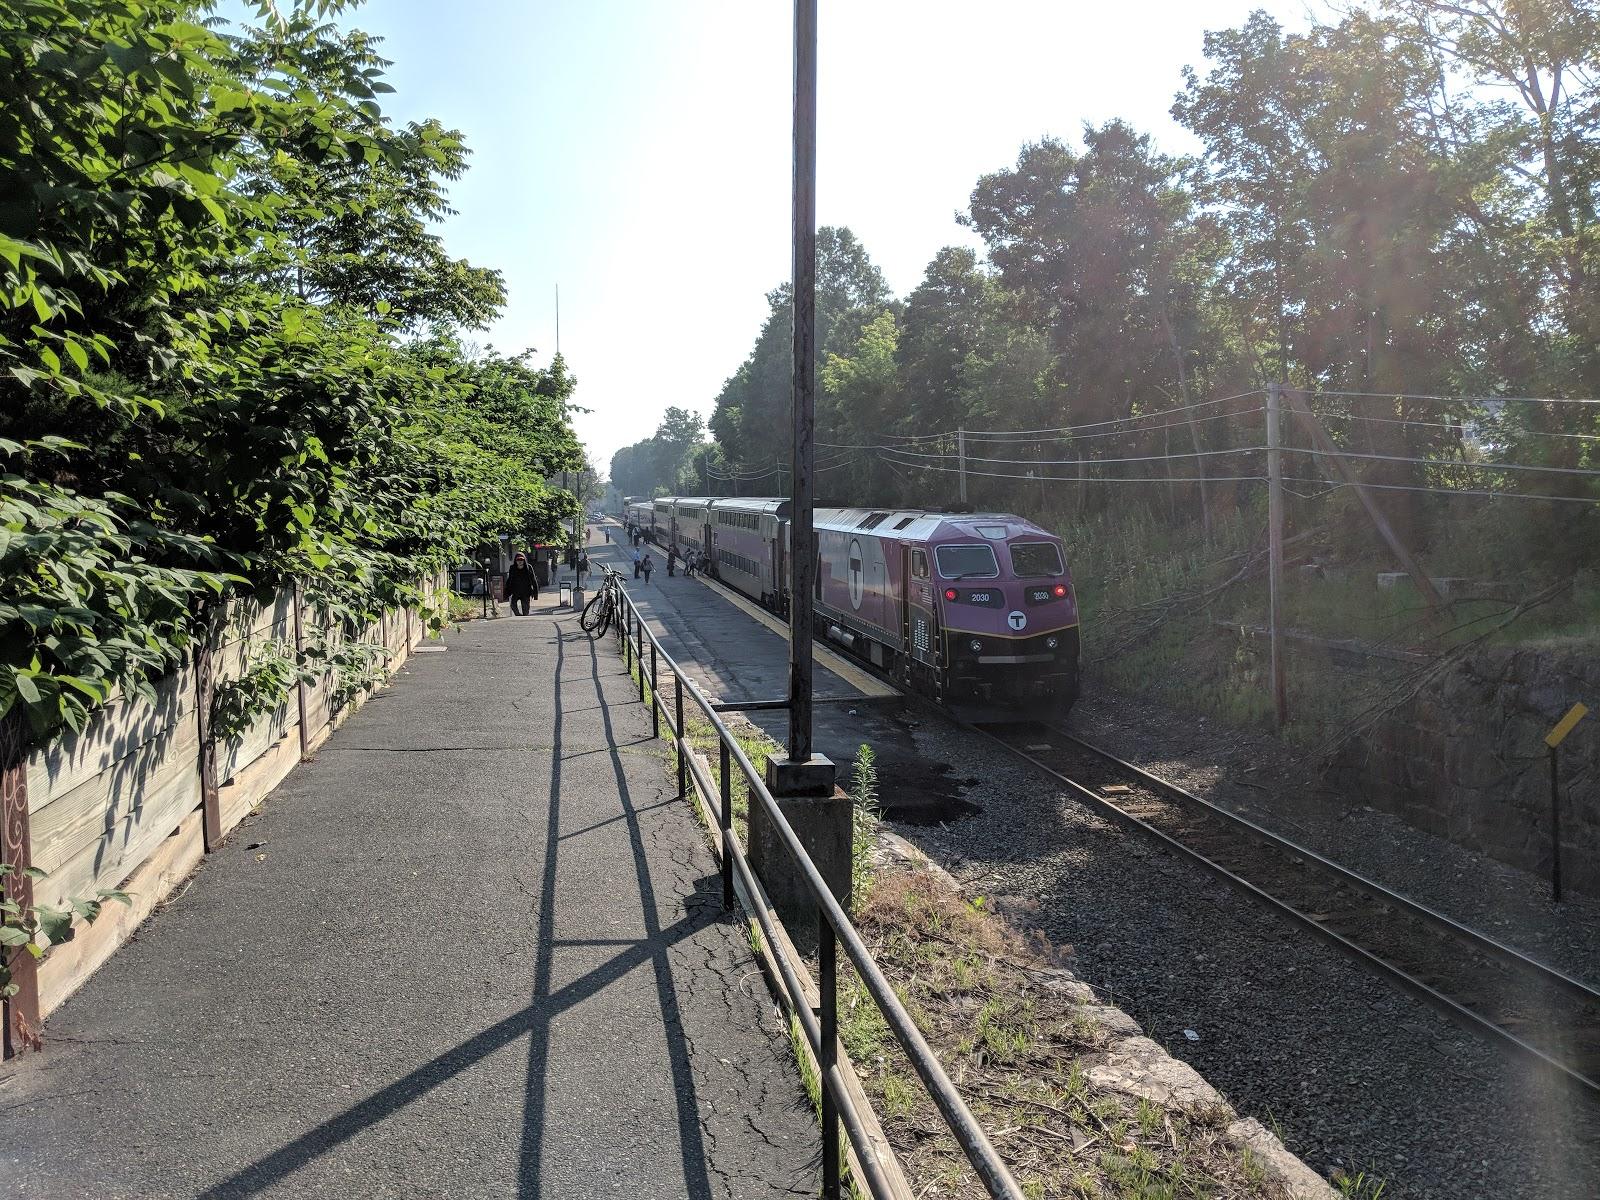 Franklin Matters: MBTA: Franklin Line shuttle weekend - Jun 15-16